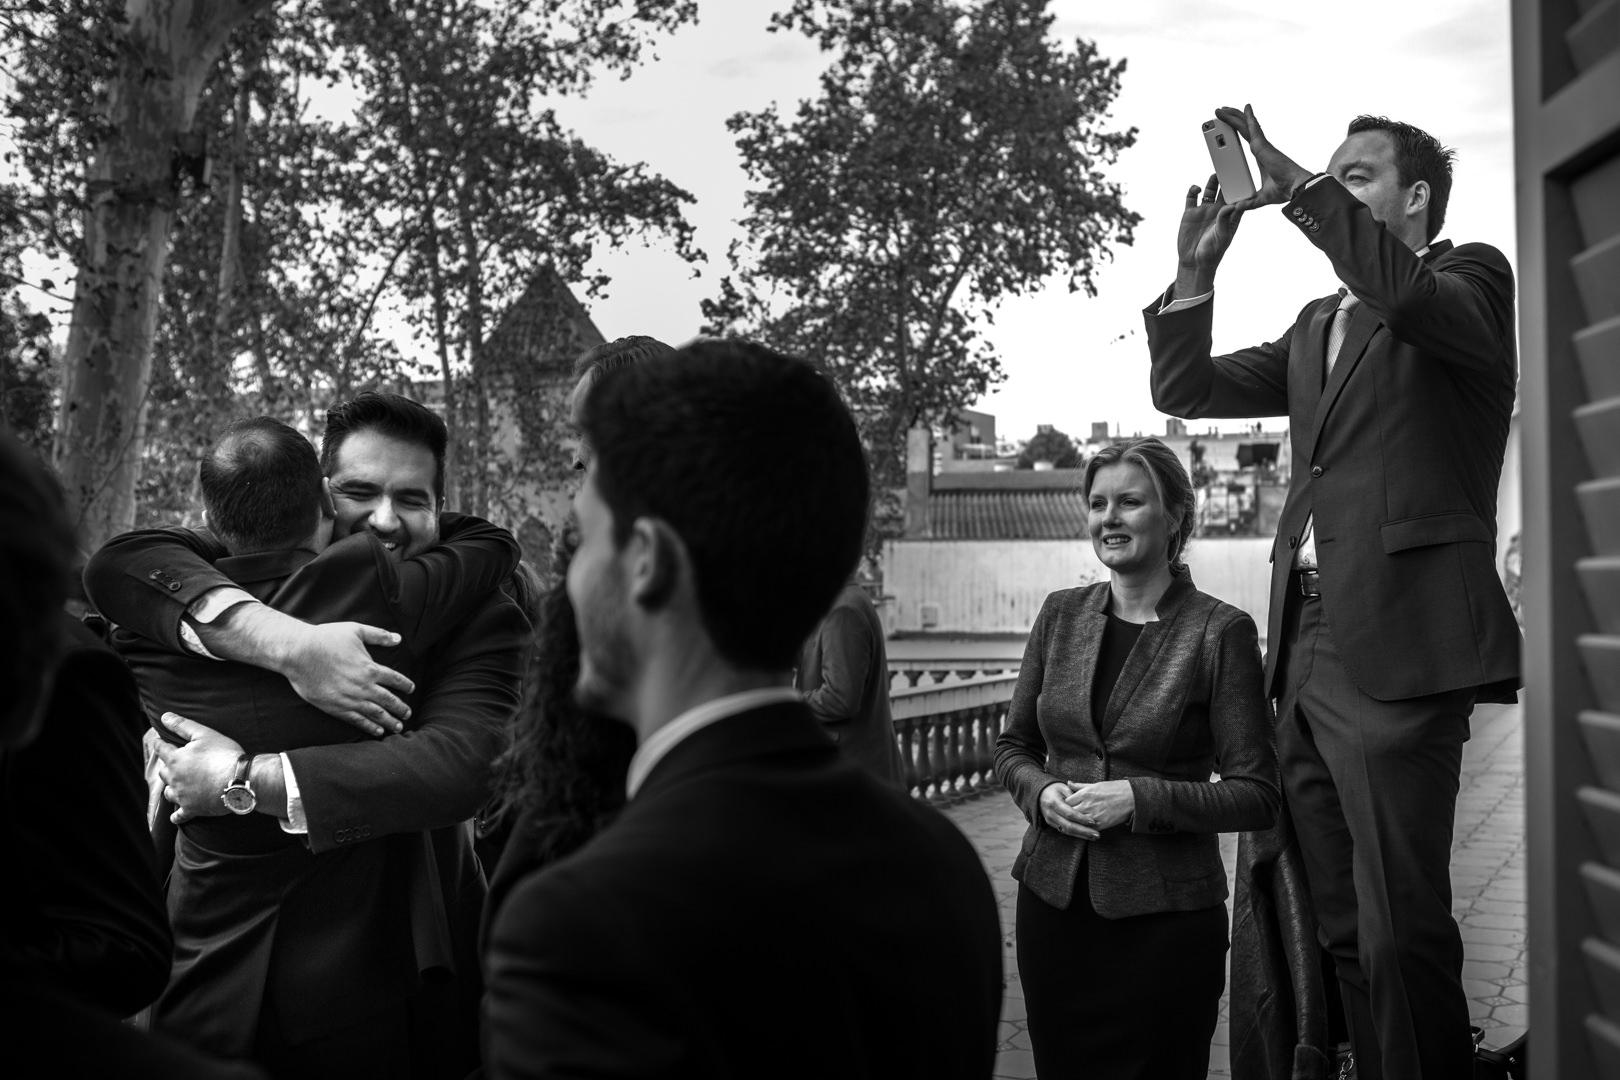 Same-sex-wedding-barcelona-boda- gay-samesex-engagement-Rafael-Torres-fotografo-bodas-sevilla-madrid-barcelona-wedding-photographer--25.jpg